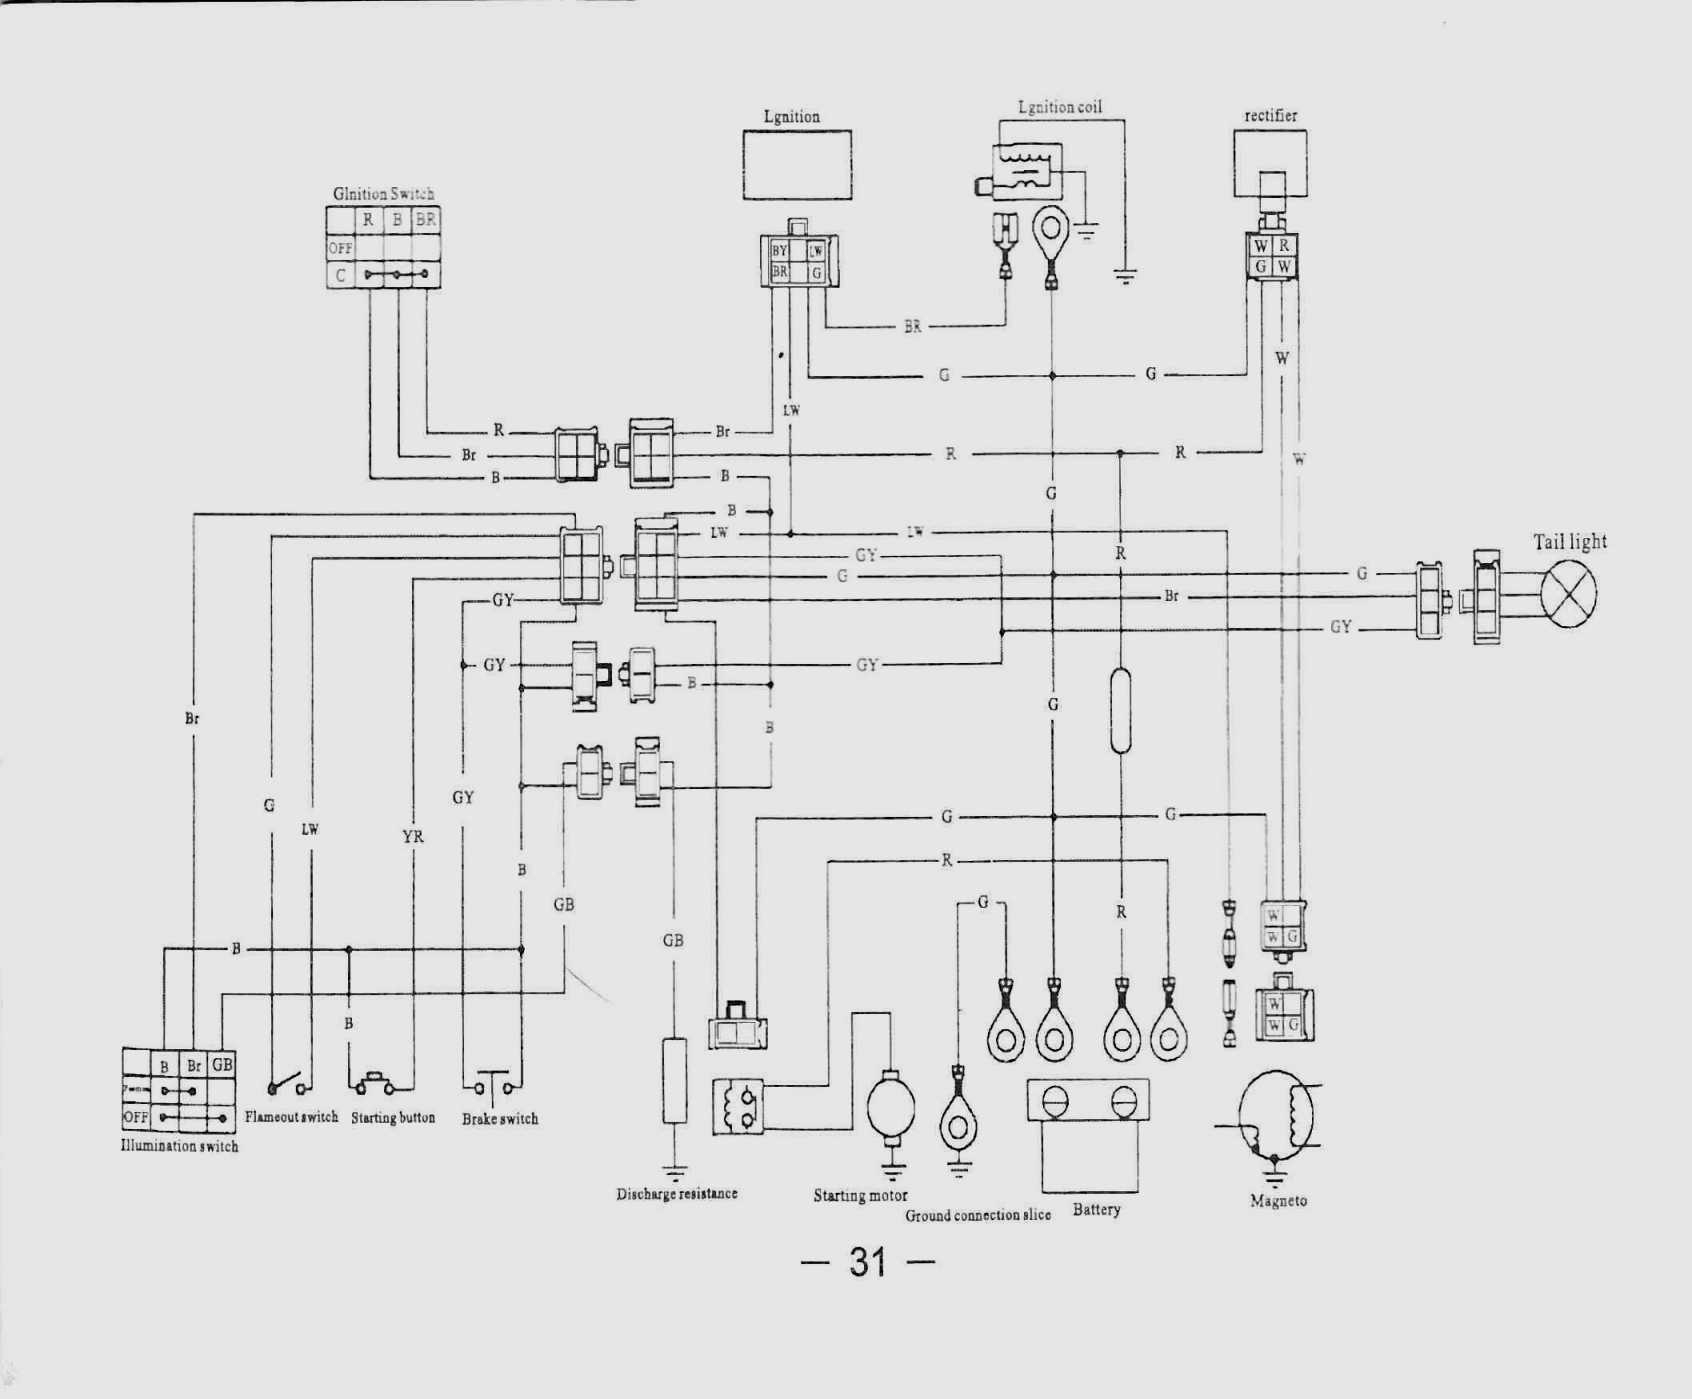 110Cc Go Kart Wiring Diagram - Wiring Diagram Data Oreo - Taotao 110Cc Atv Wiring Diagram